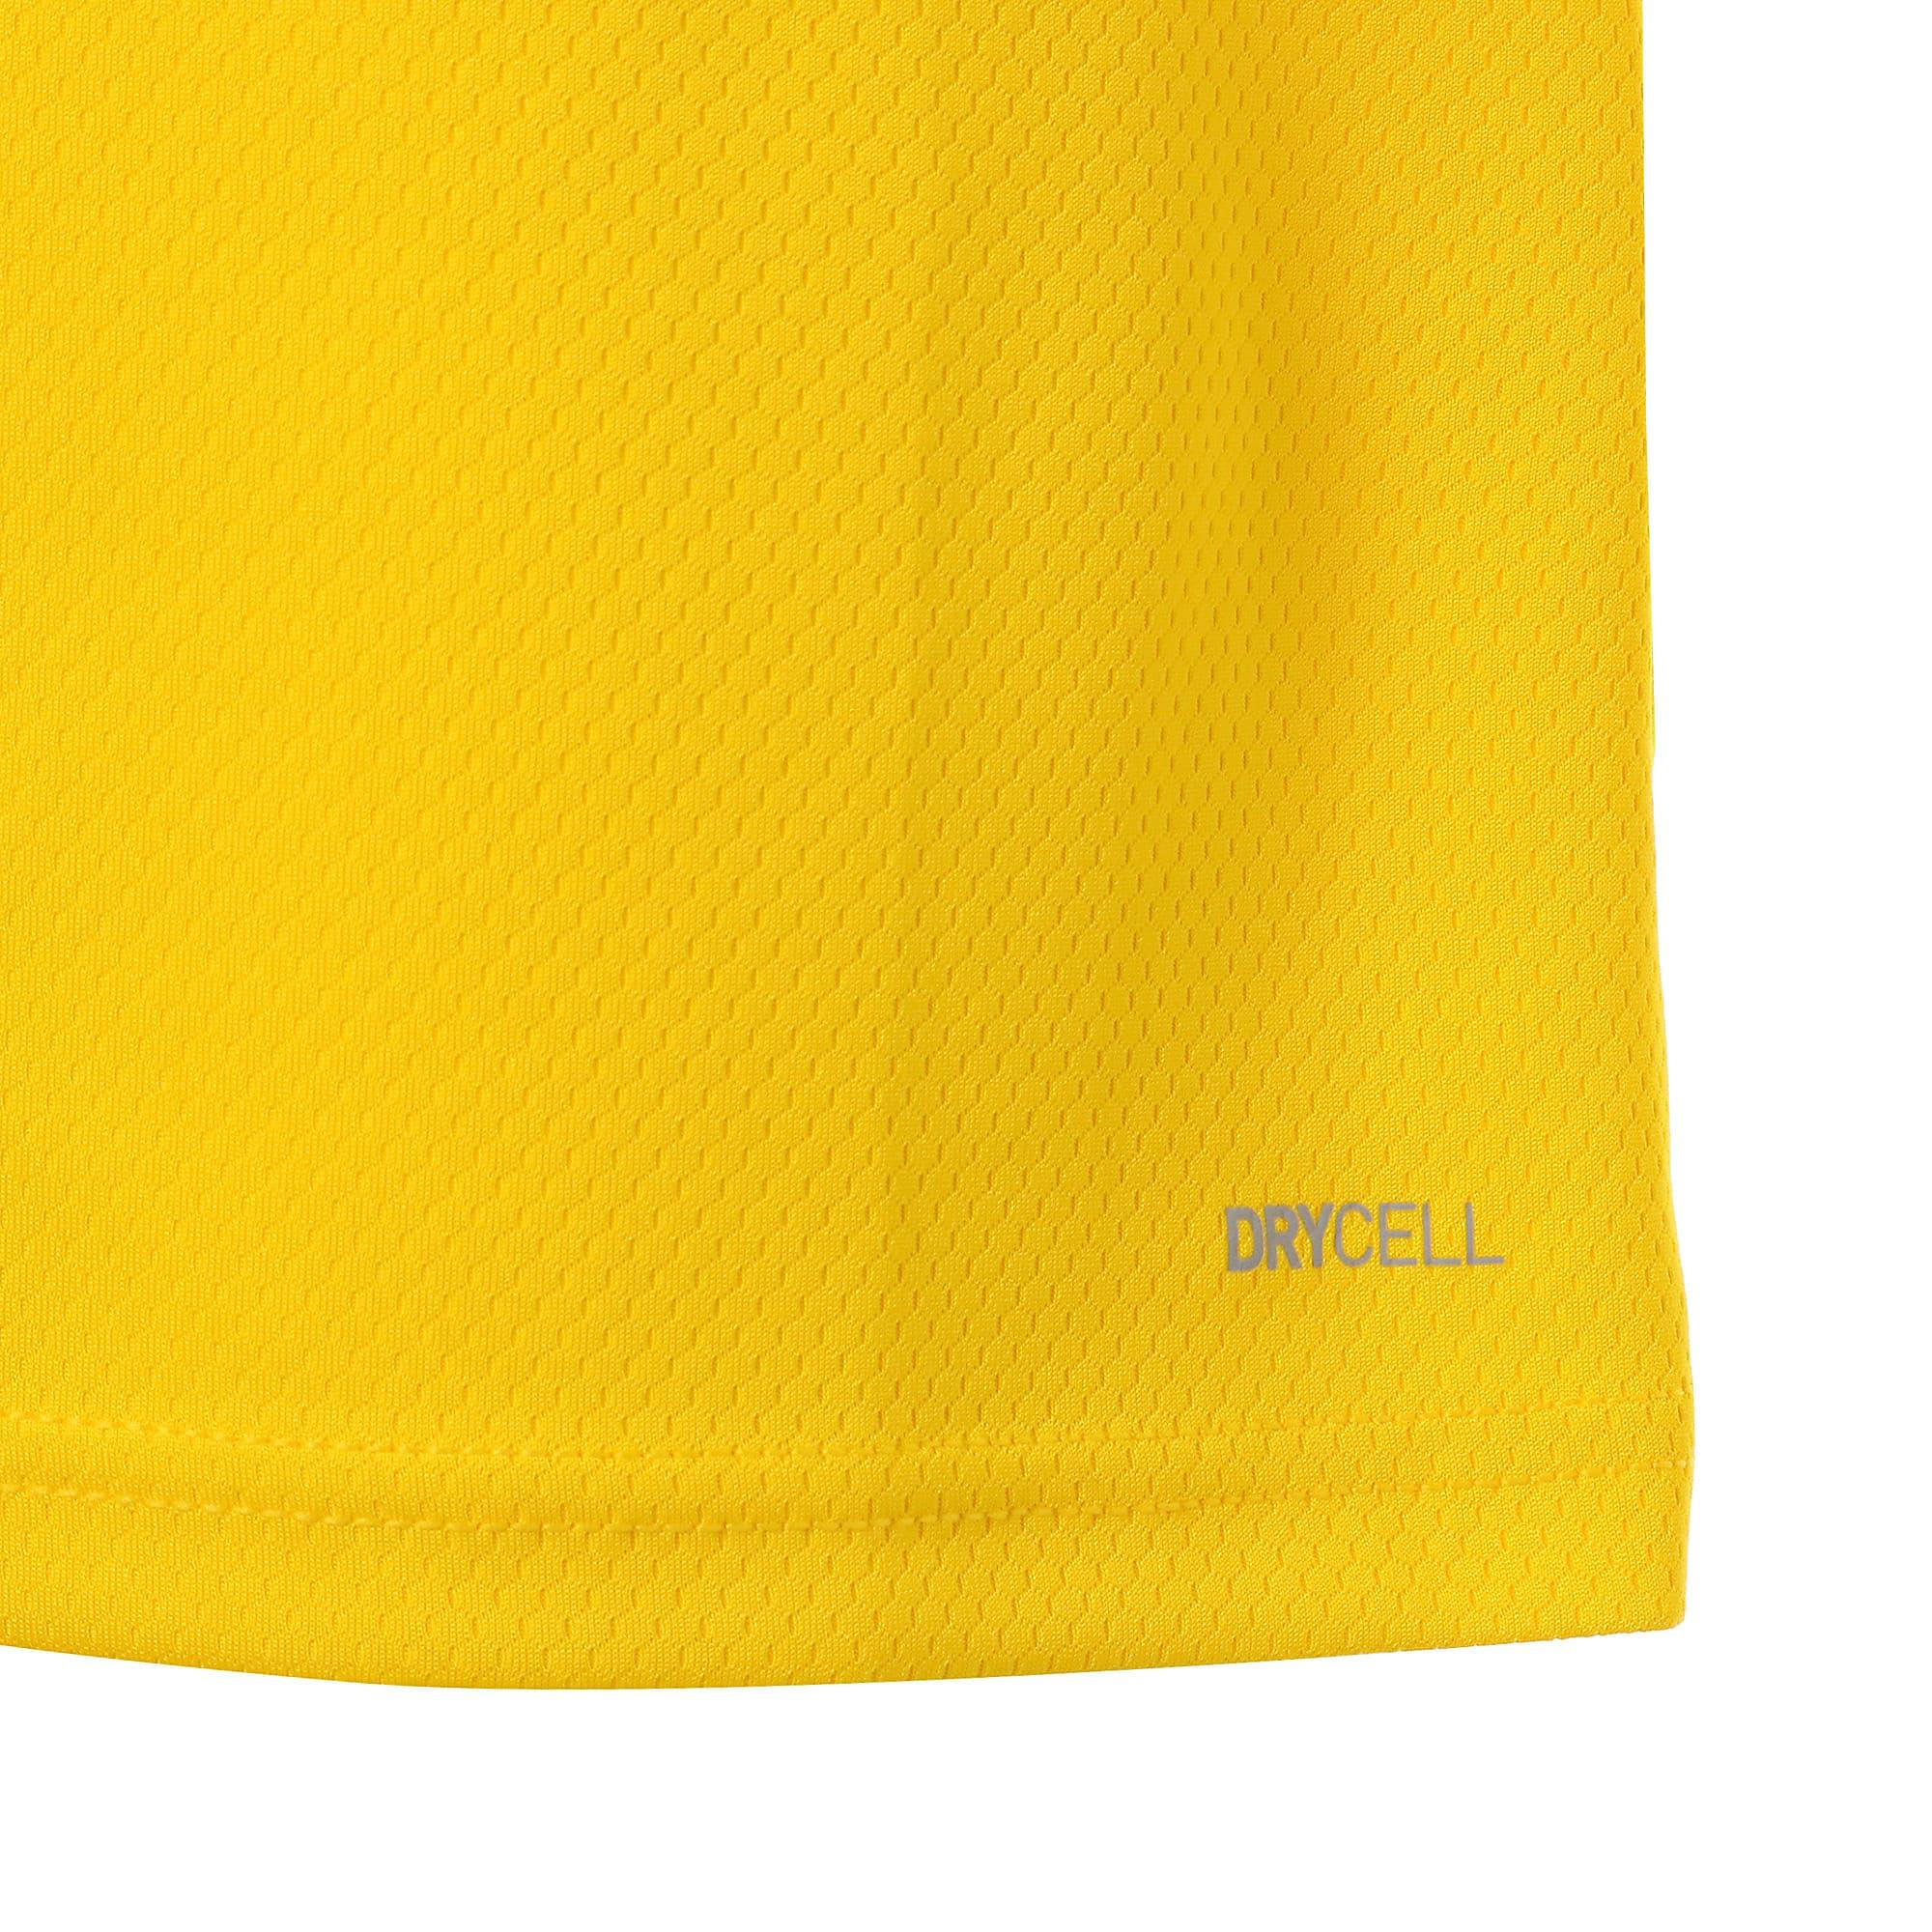 Thumbnail 6 of ドルトムント BVB SS ホーム オーセンティック シャツ 半袖, Cyber Yellow-Puma Black, medium-JPN